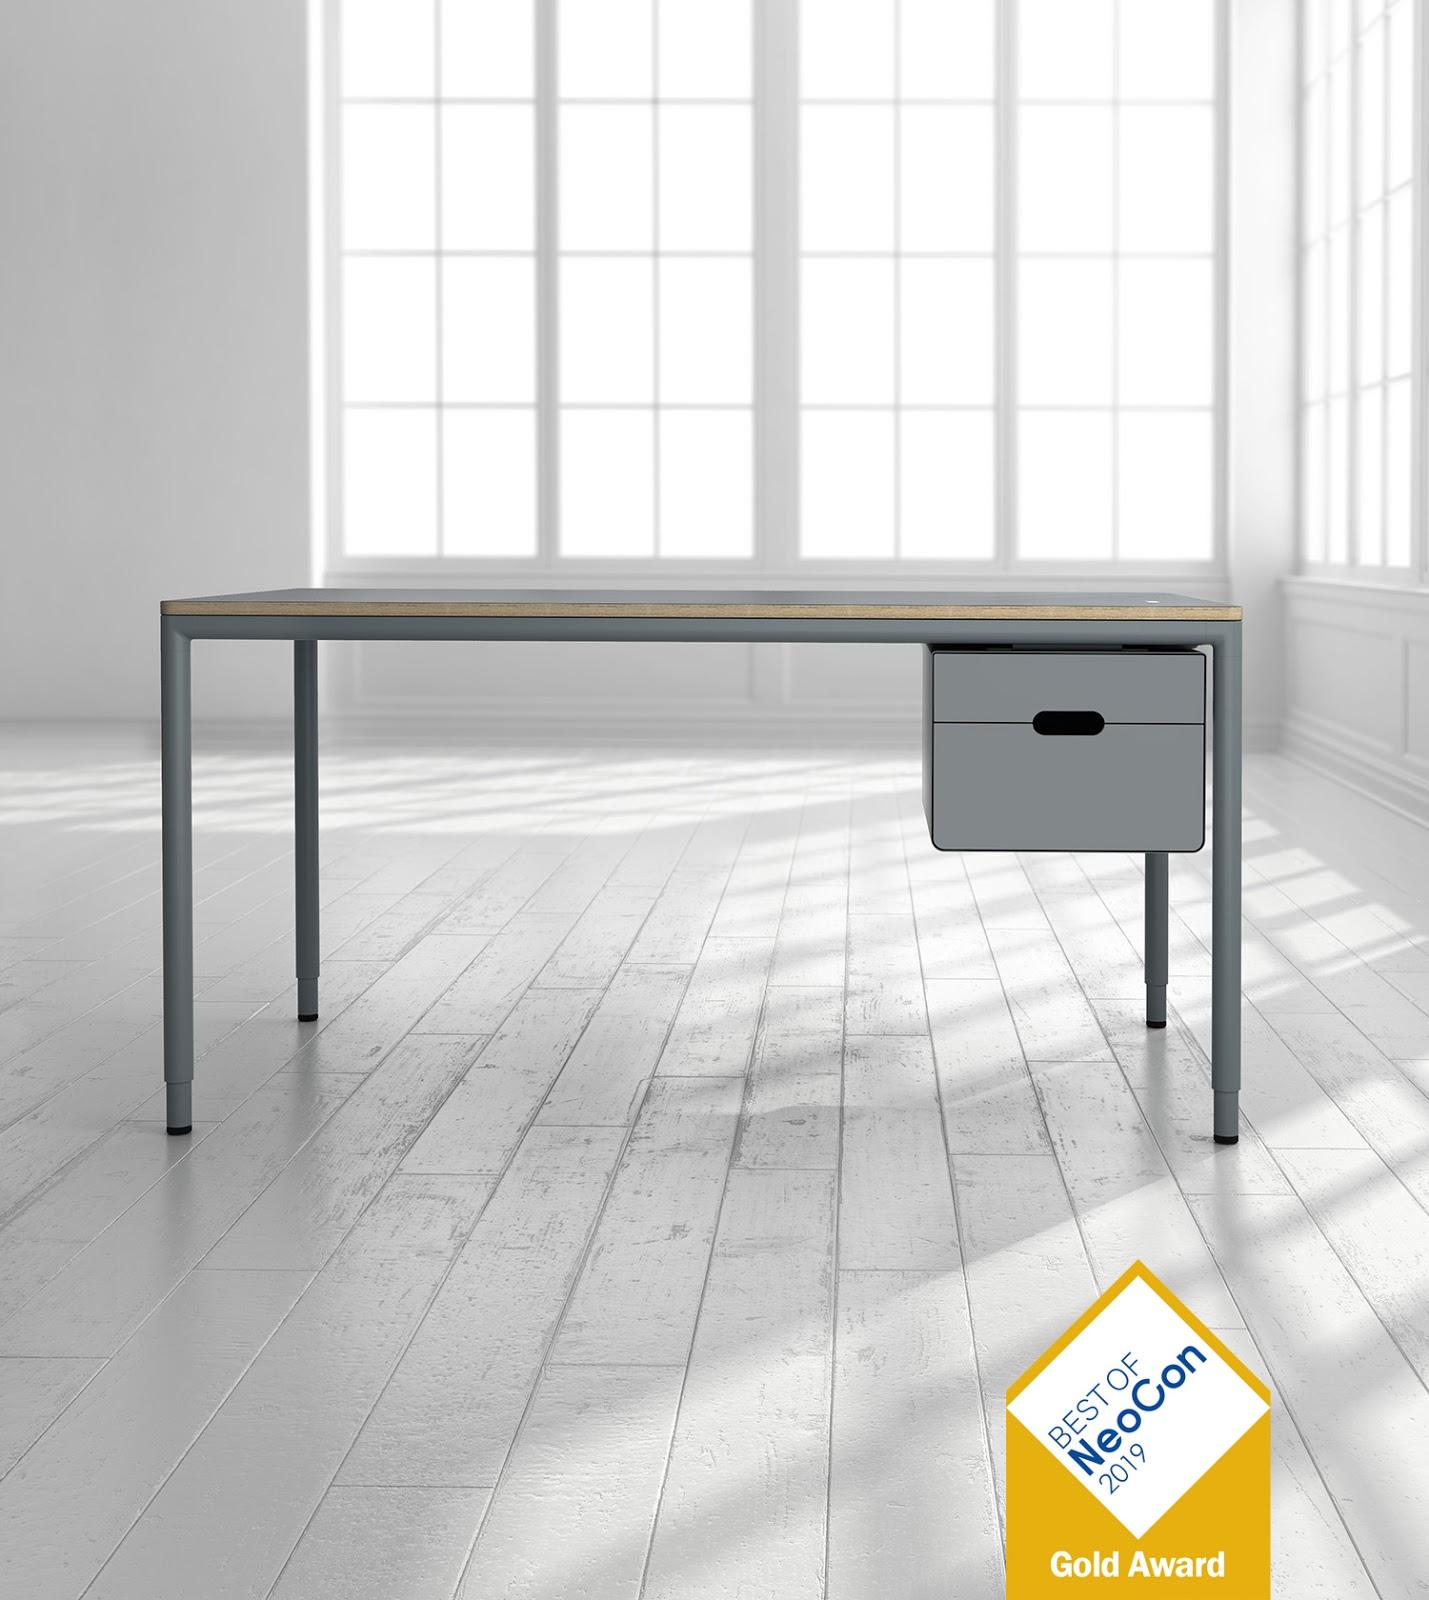 Watson Cloud9 Desk Award